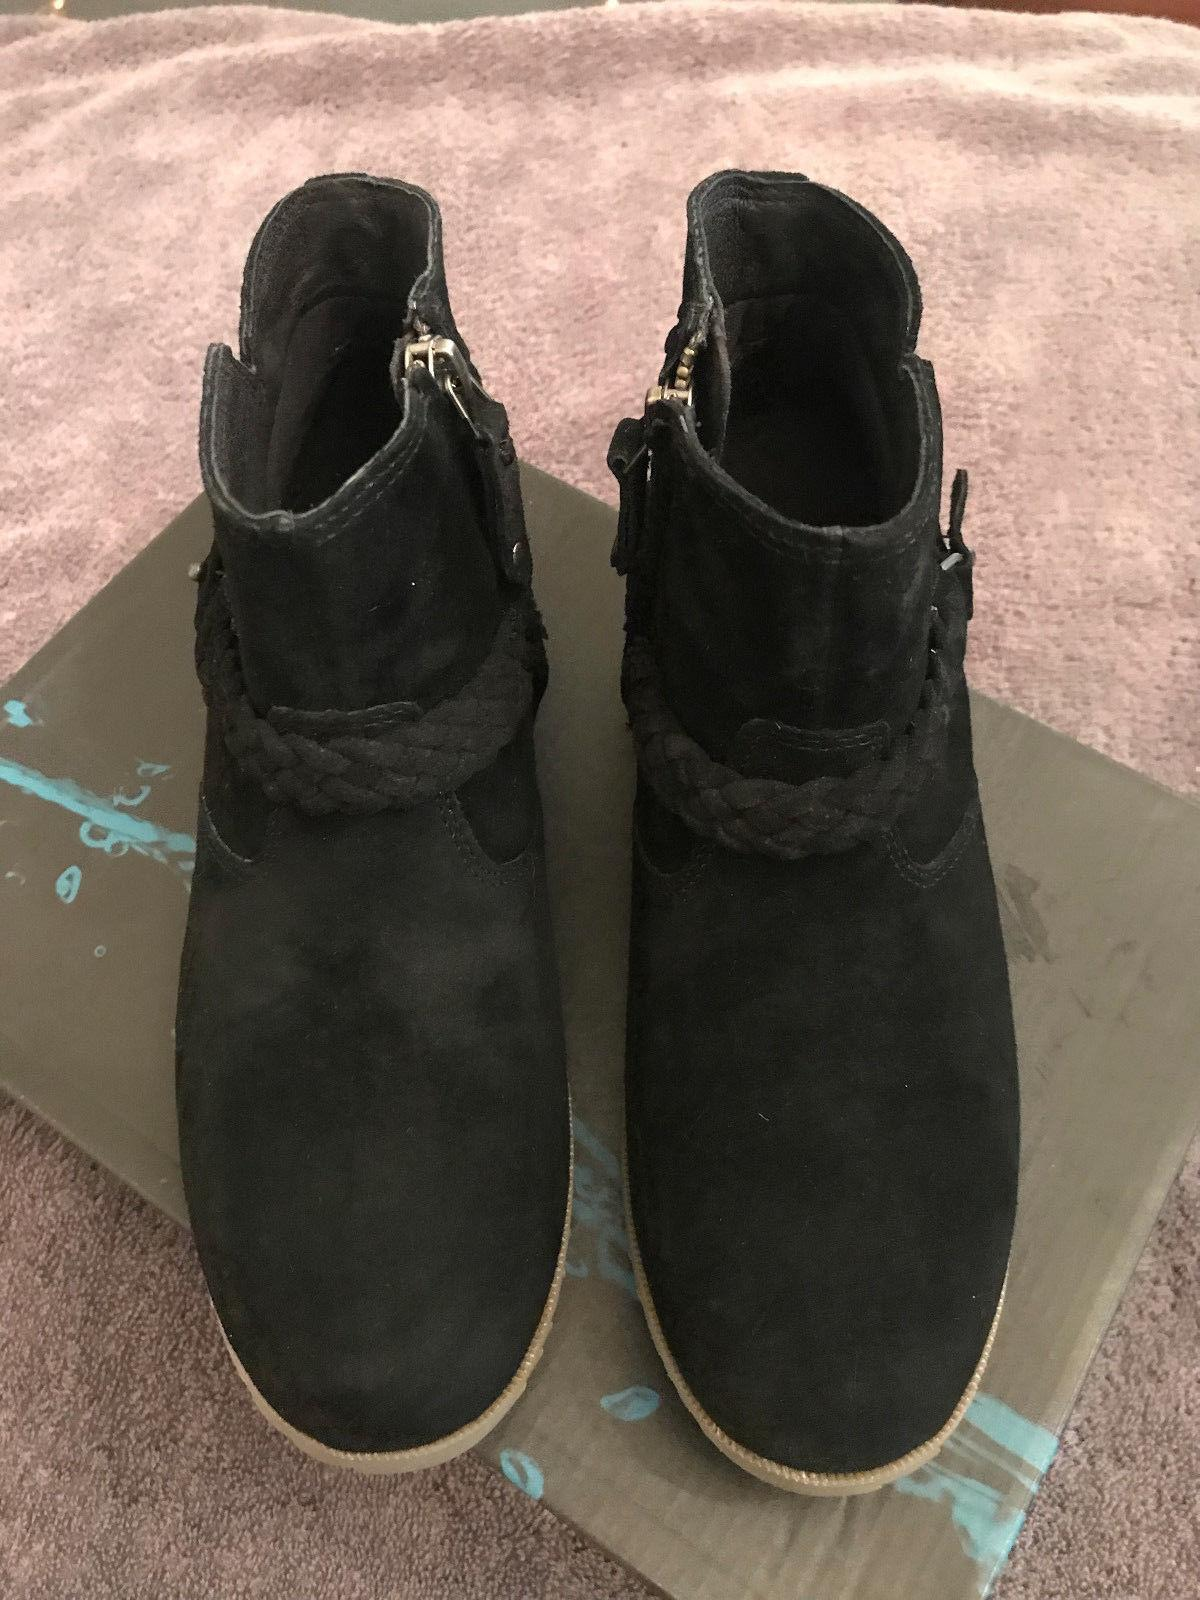 Teva Women's Delavina Black Suede Ankle Boots, Size 7M, NIB